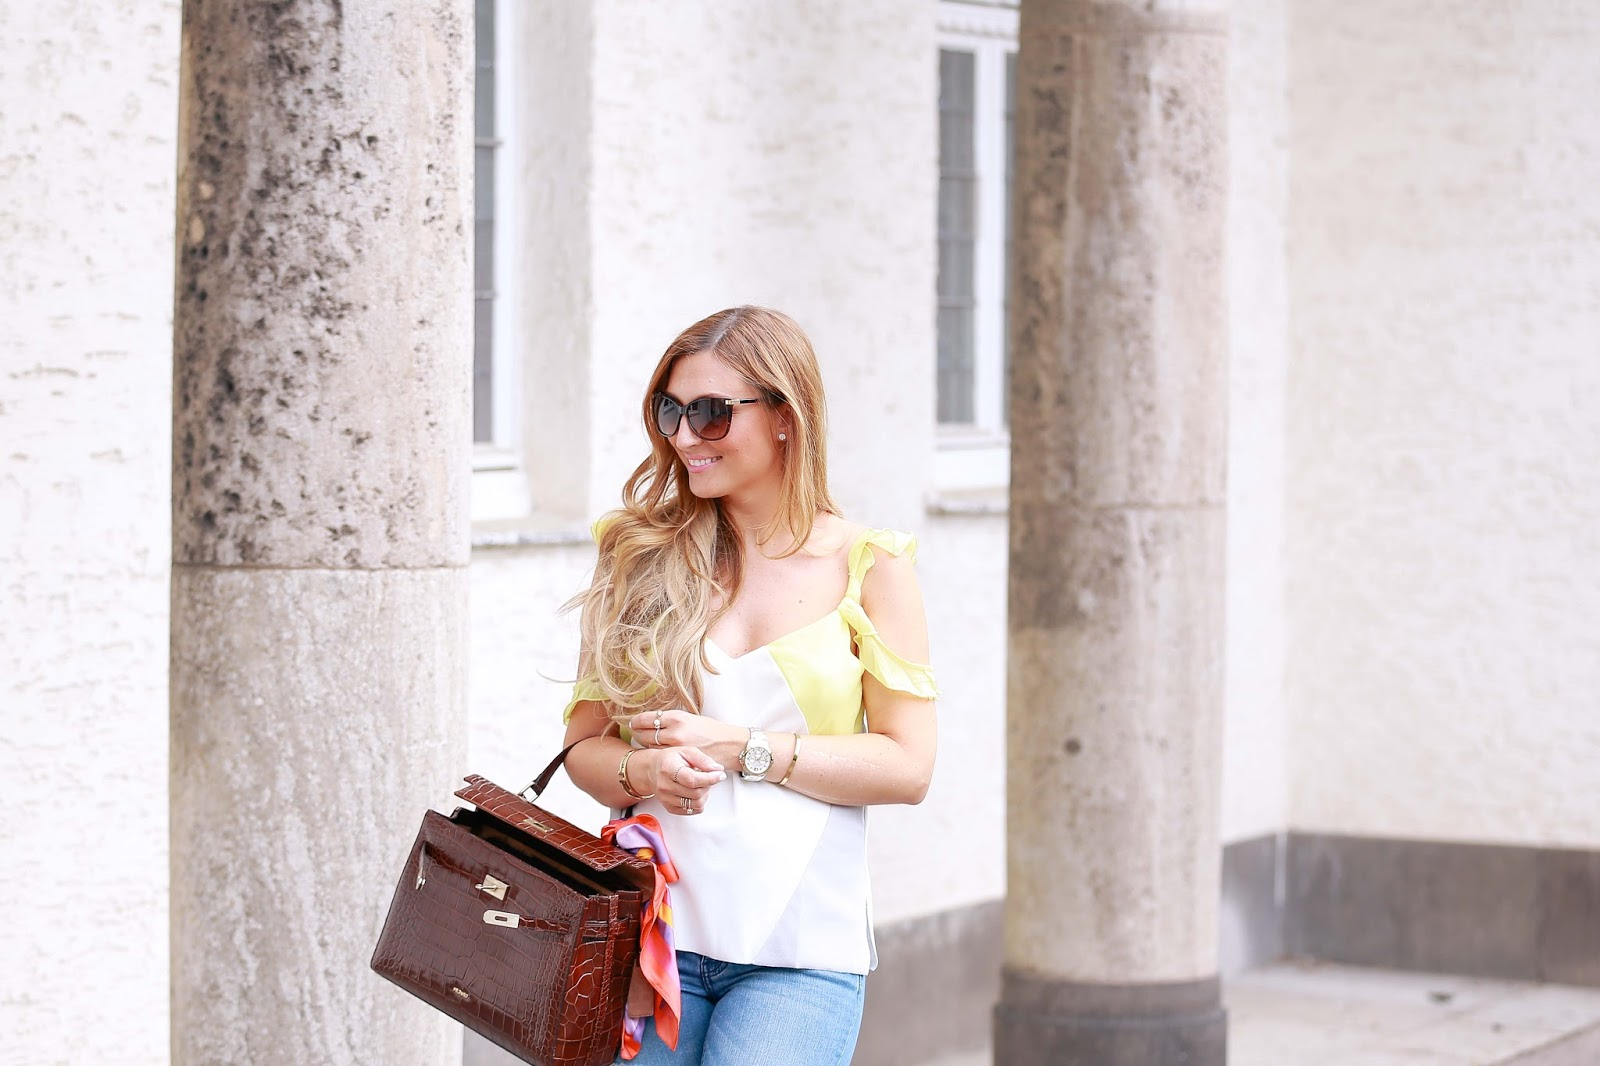 zara-top-fashionstylebyjohanna-fashionblogger-aus-frankfurt-icard-miranda-Tasche-mit-tuch-blogger-deutsche-fashionblogger-fashionblogger-aus-deutschland